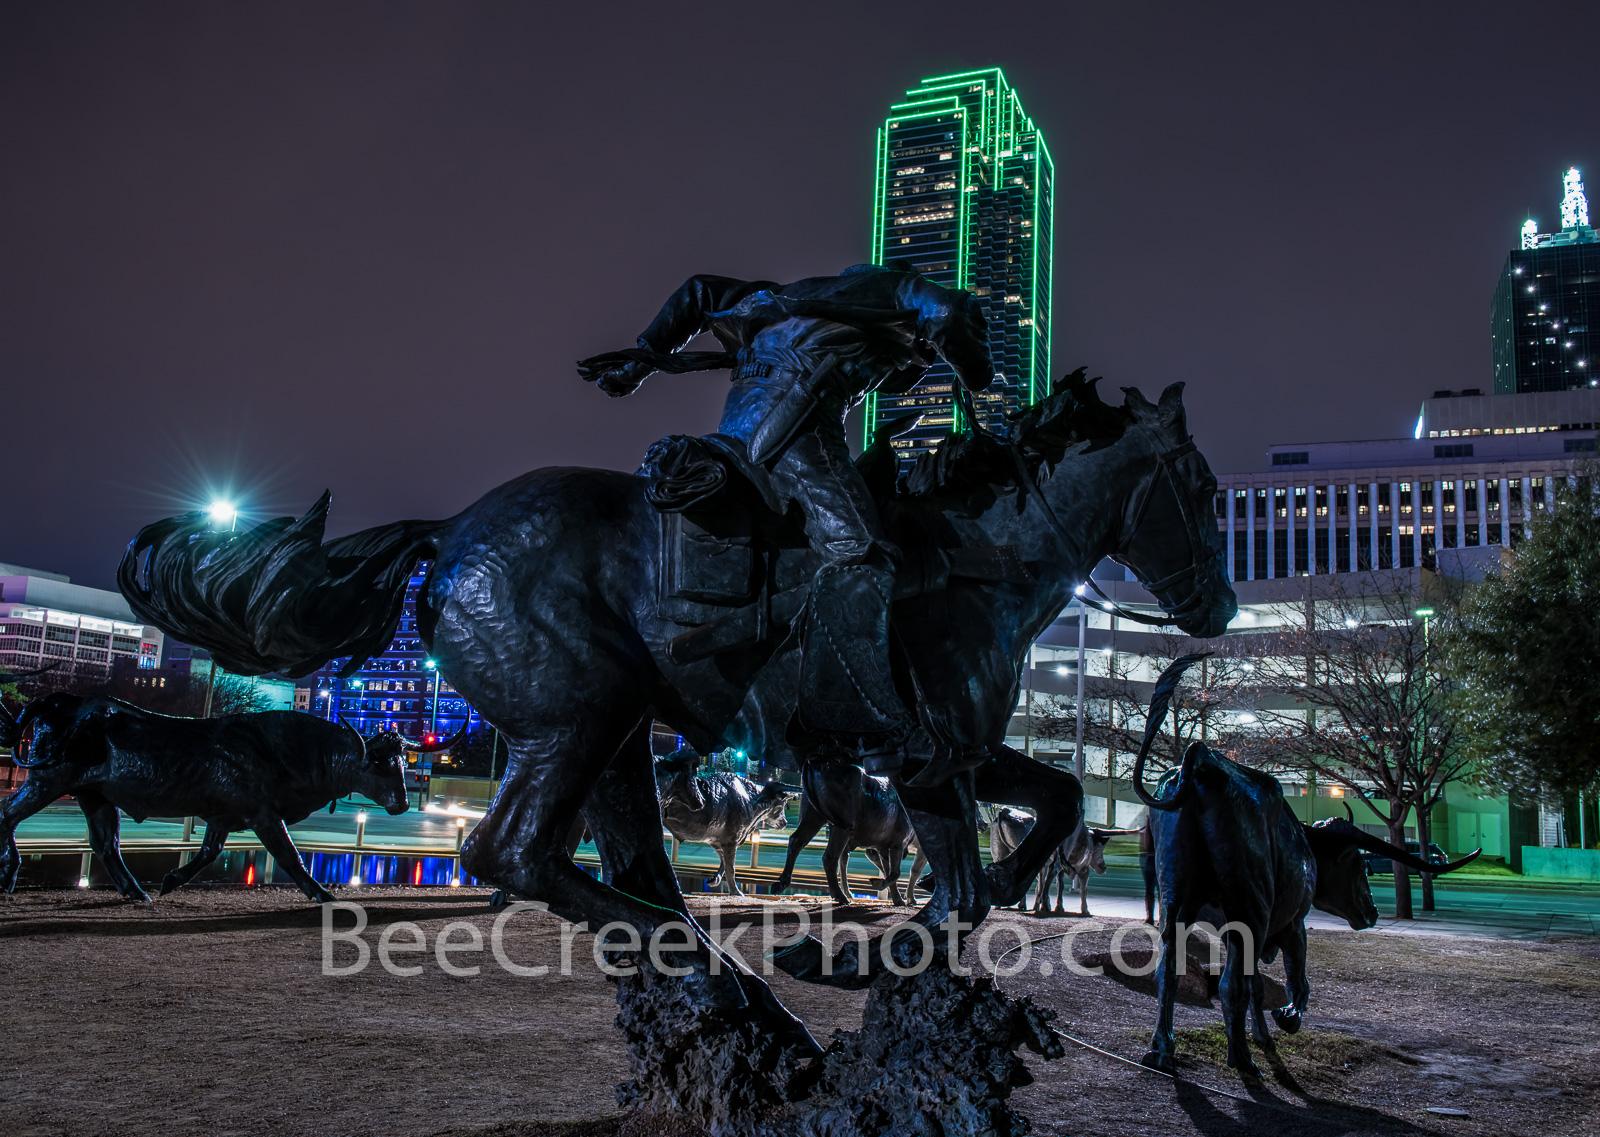 Dallas, Pioneer Plaza, Dallas parks, cowboy,  cattle drive, cowboy trail rider, horse, longhorn bronze statues, park, city of dallas, downtown dallas, historical, natural, dallas night, , photo